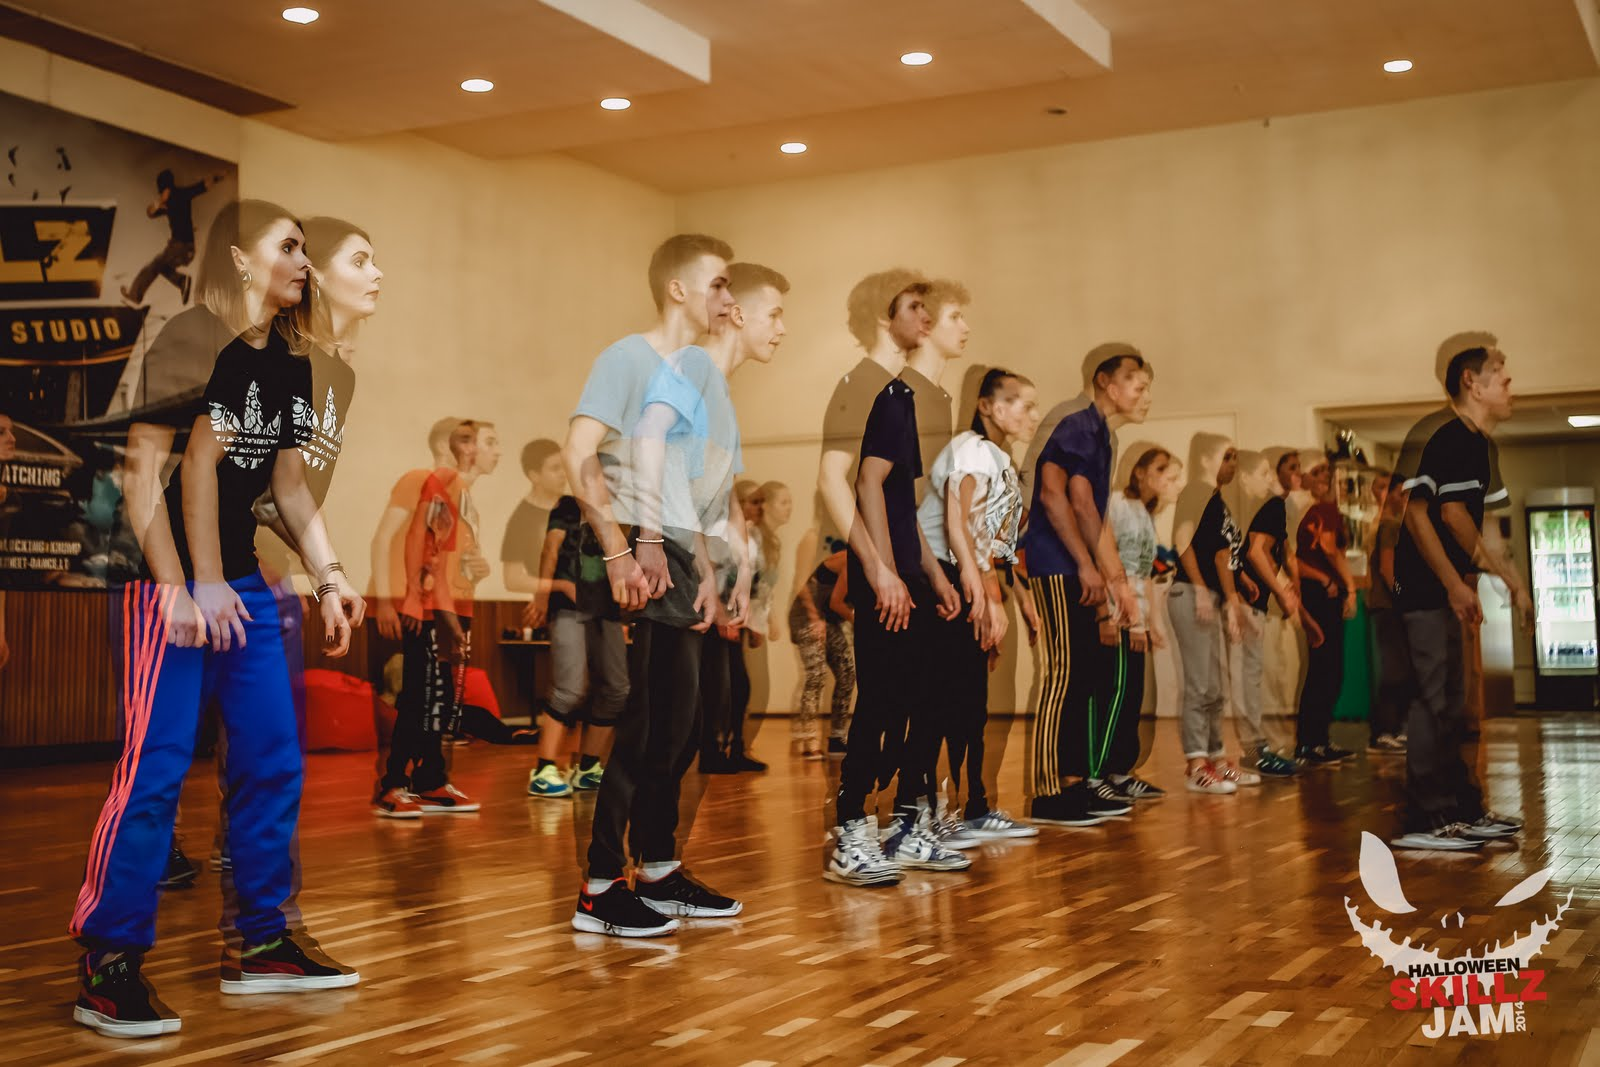 Šokių seminarai su Bouboo, Kaczorex, Tanya, Marek - _MG_7393.jpg